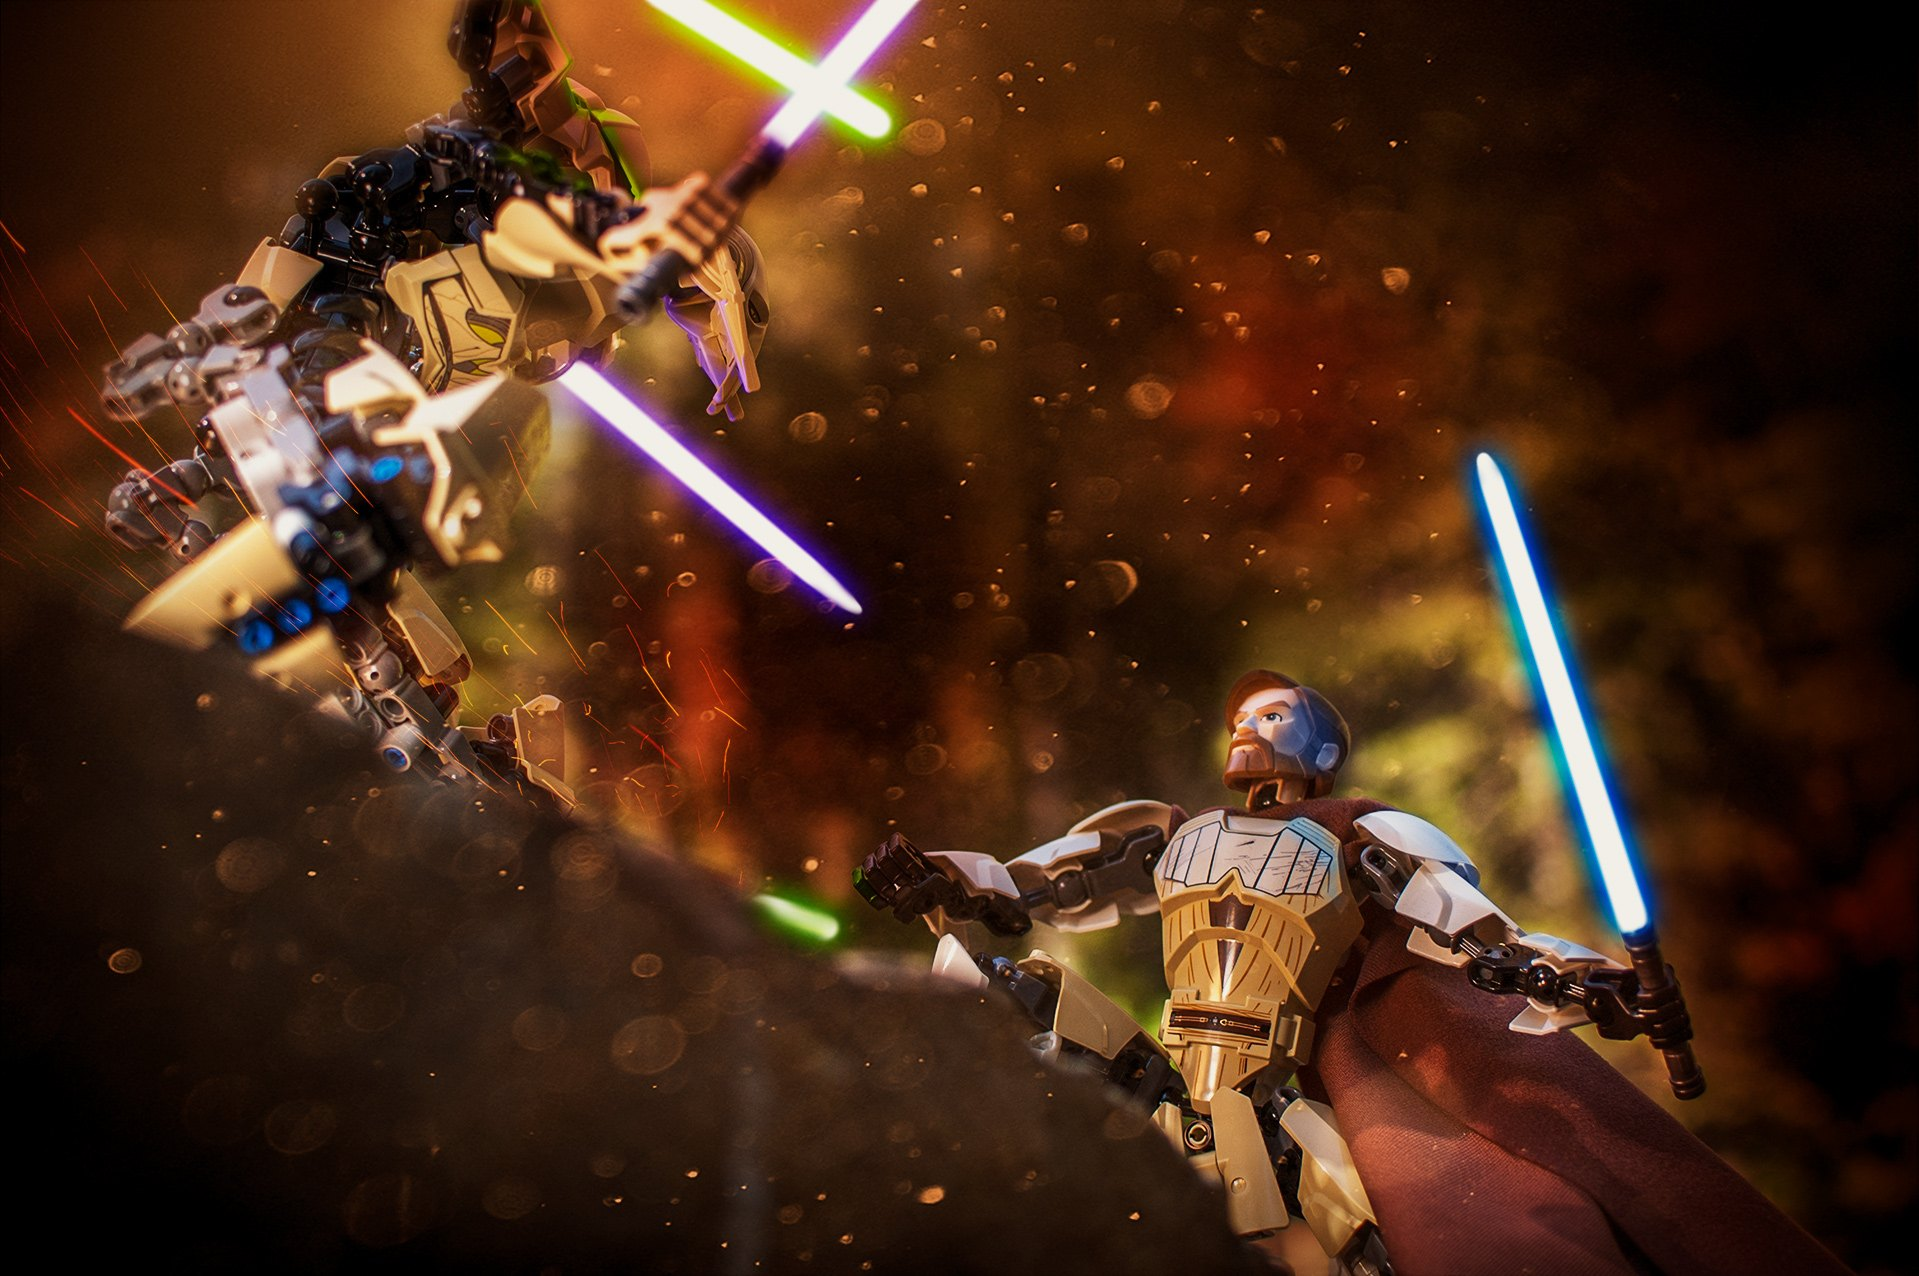 General Grievous Vs Obi Wan Bricksdaily